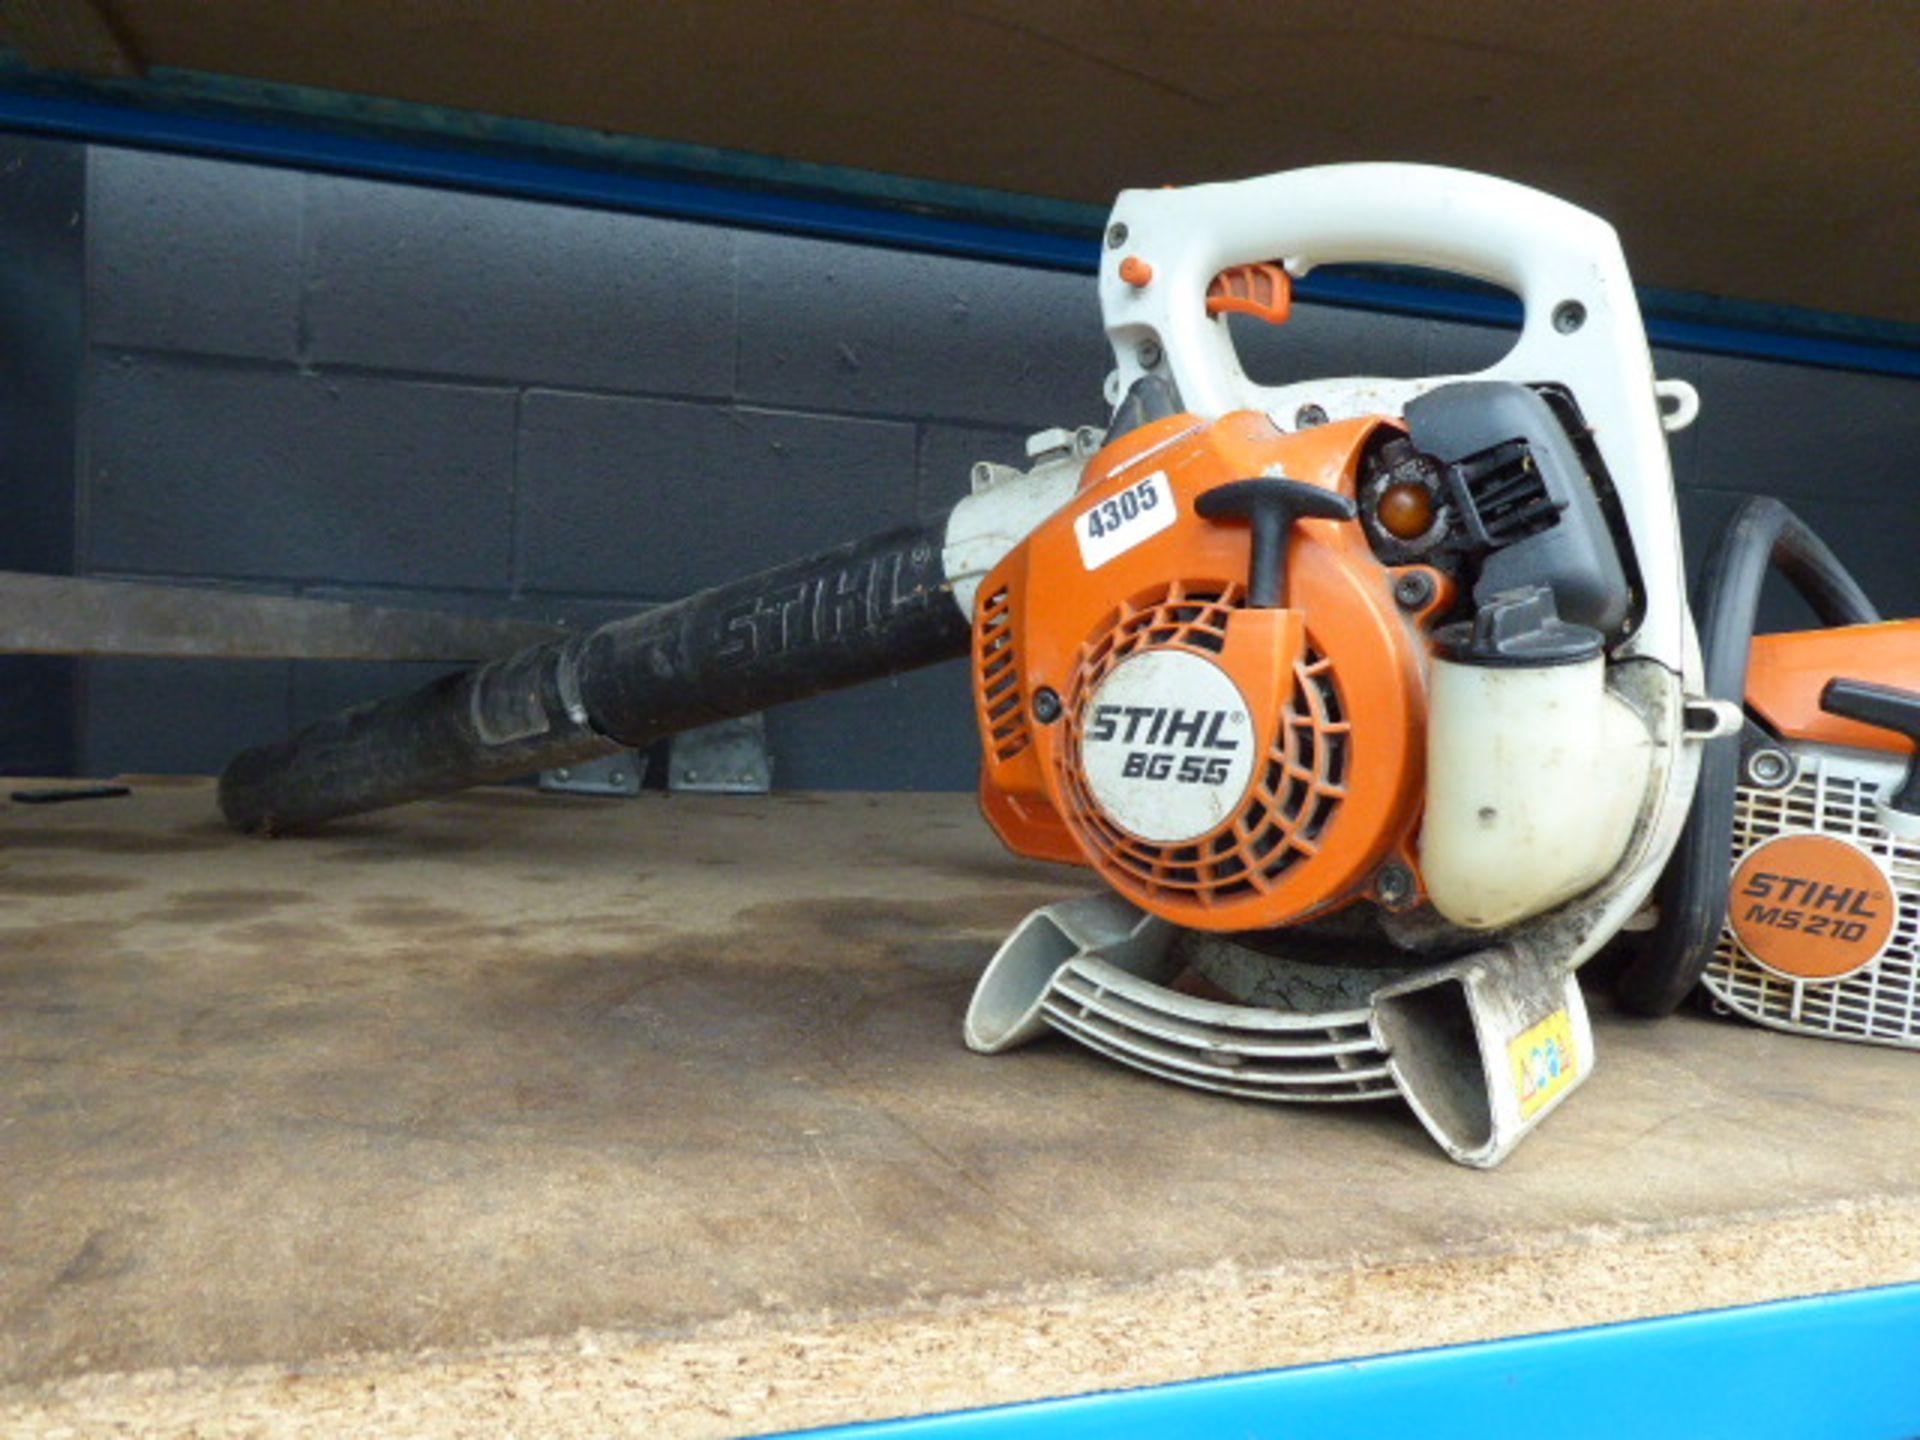 Lot 4305 - Stihl BG55 petrol powered leaf blower